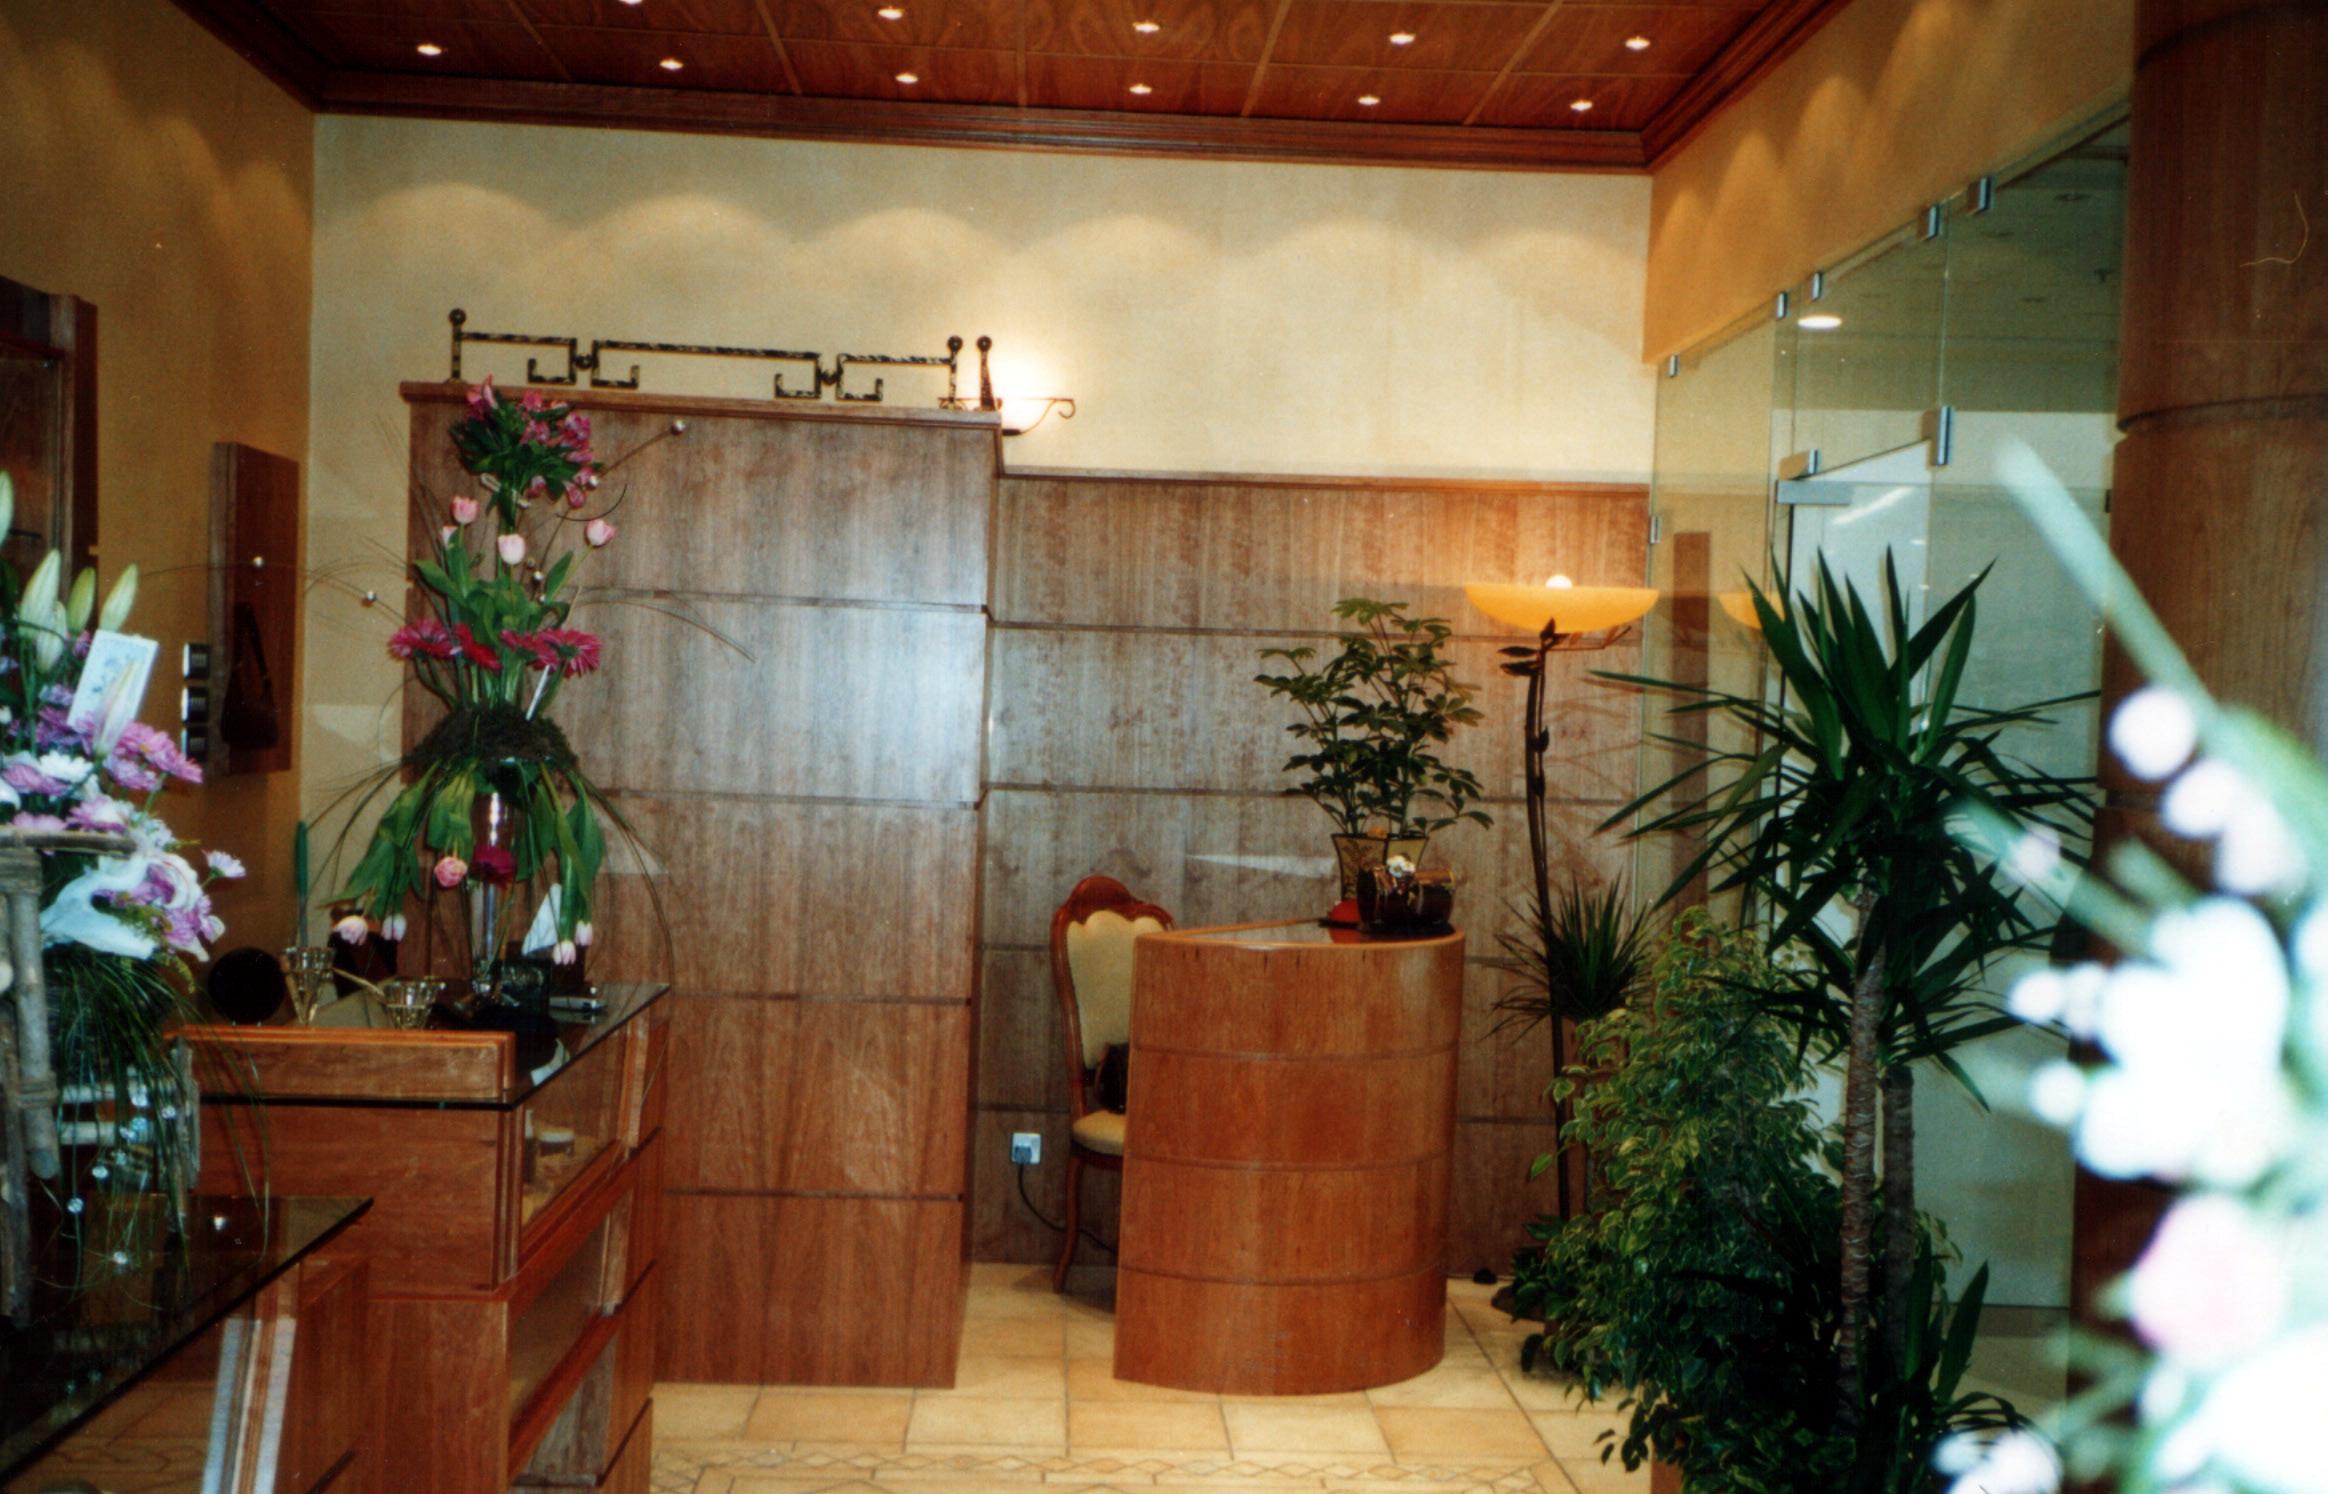 Cosmetic Shop - interior design concept